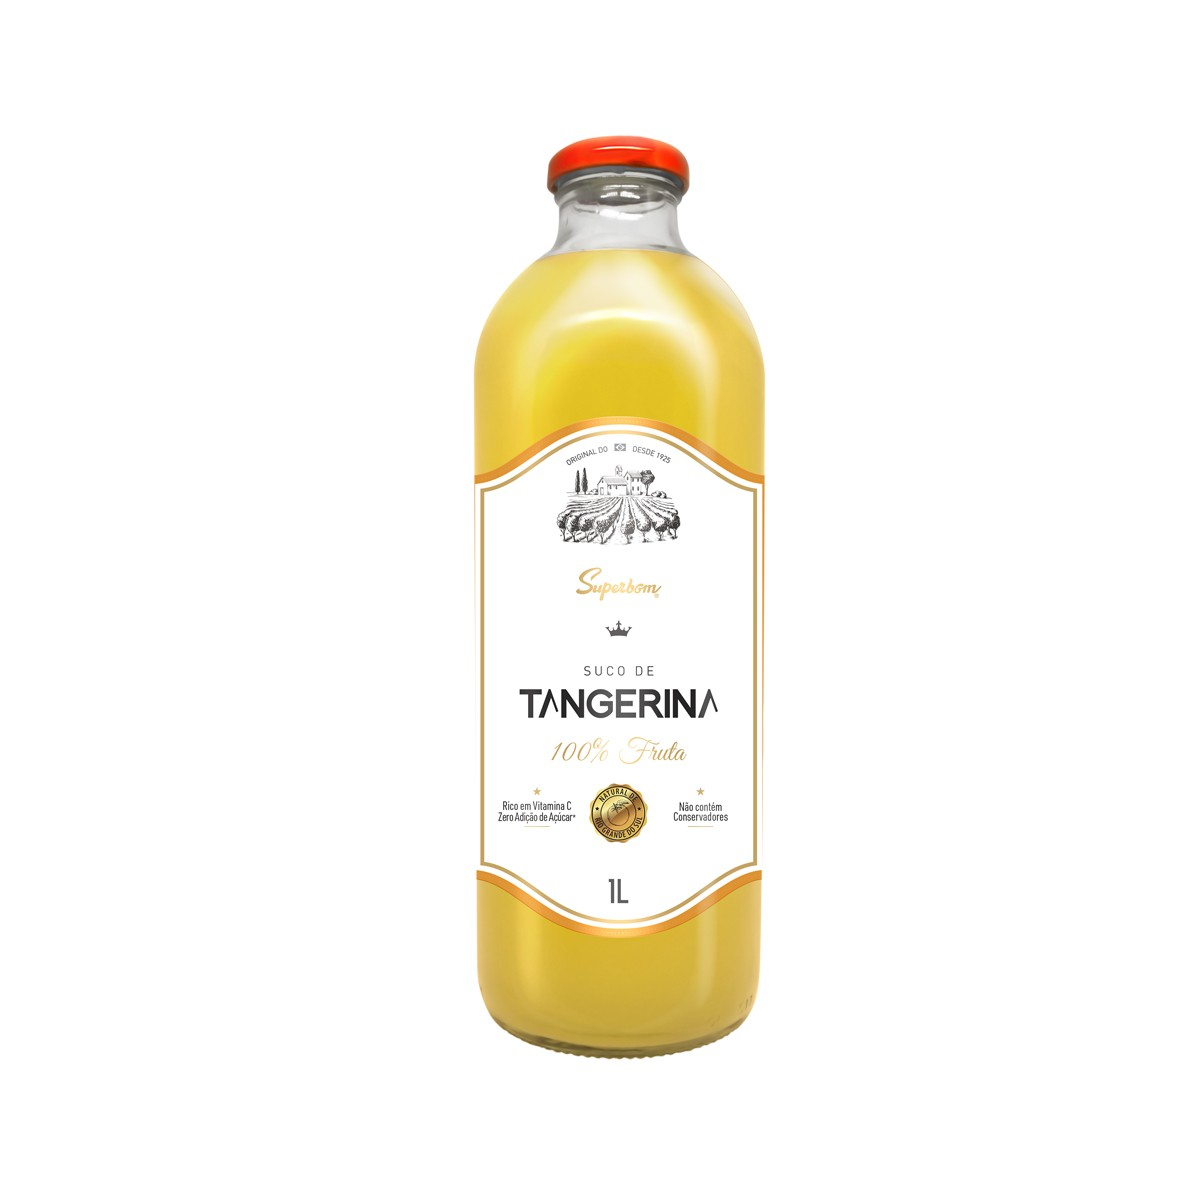 Suco de Tangerina Zero 100% fruta 1L - Super Bom